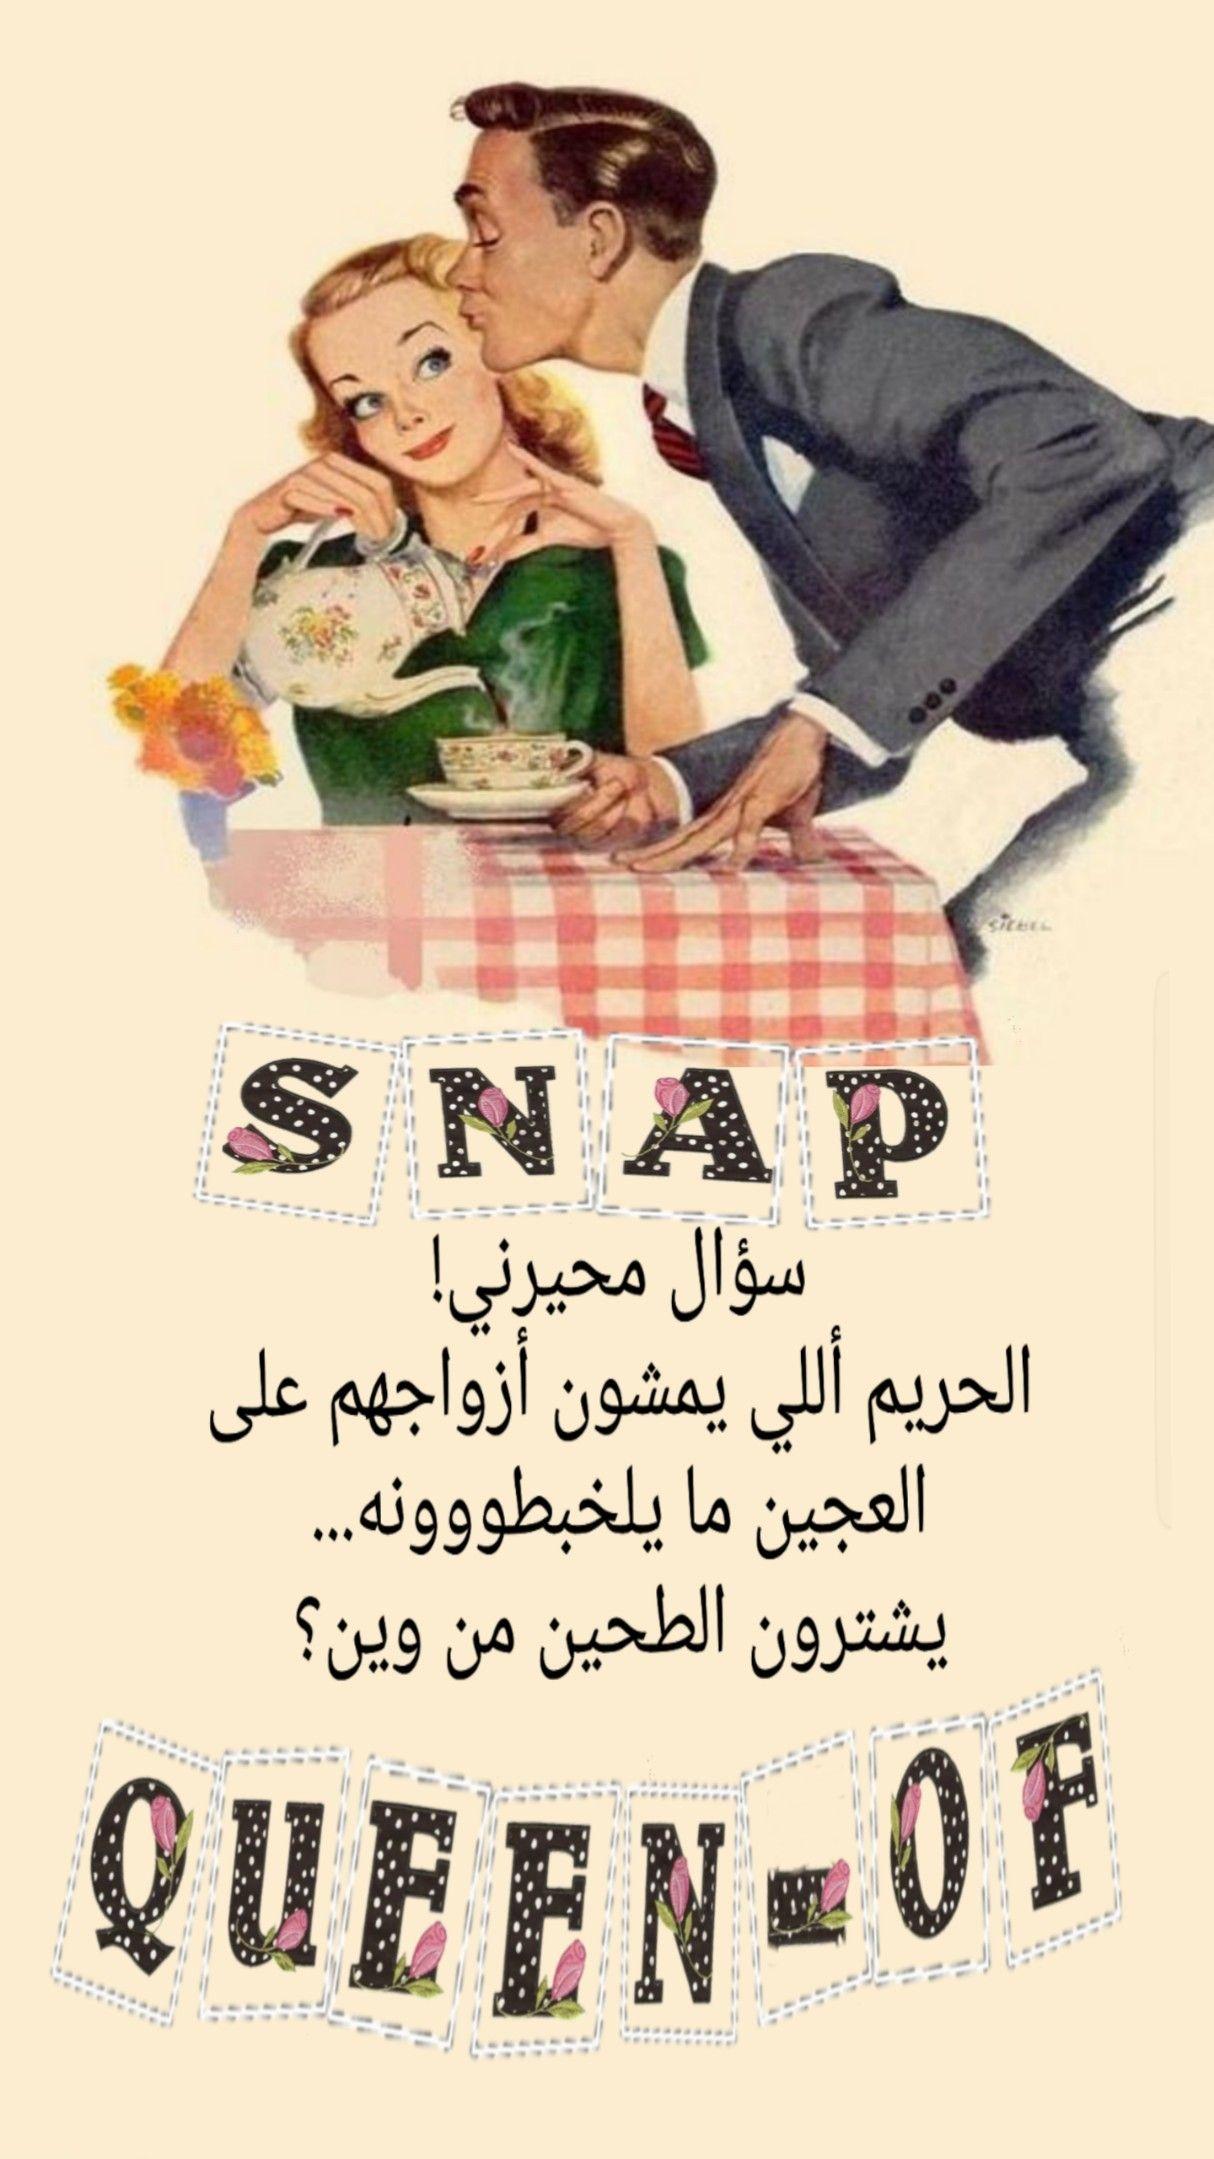 Pin By سيده الذوق On سناب شات سنابي تابعوني Comics Movie Posters Igis